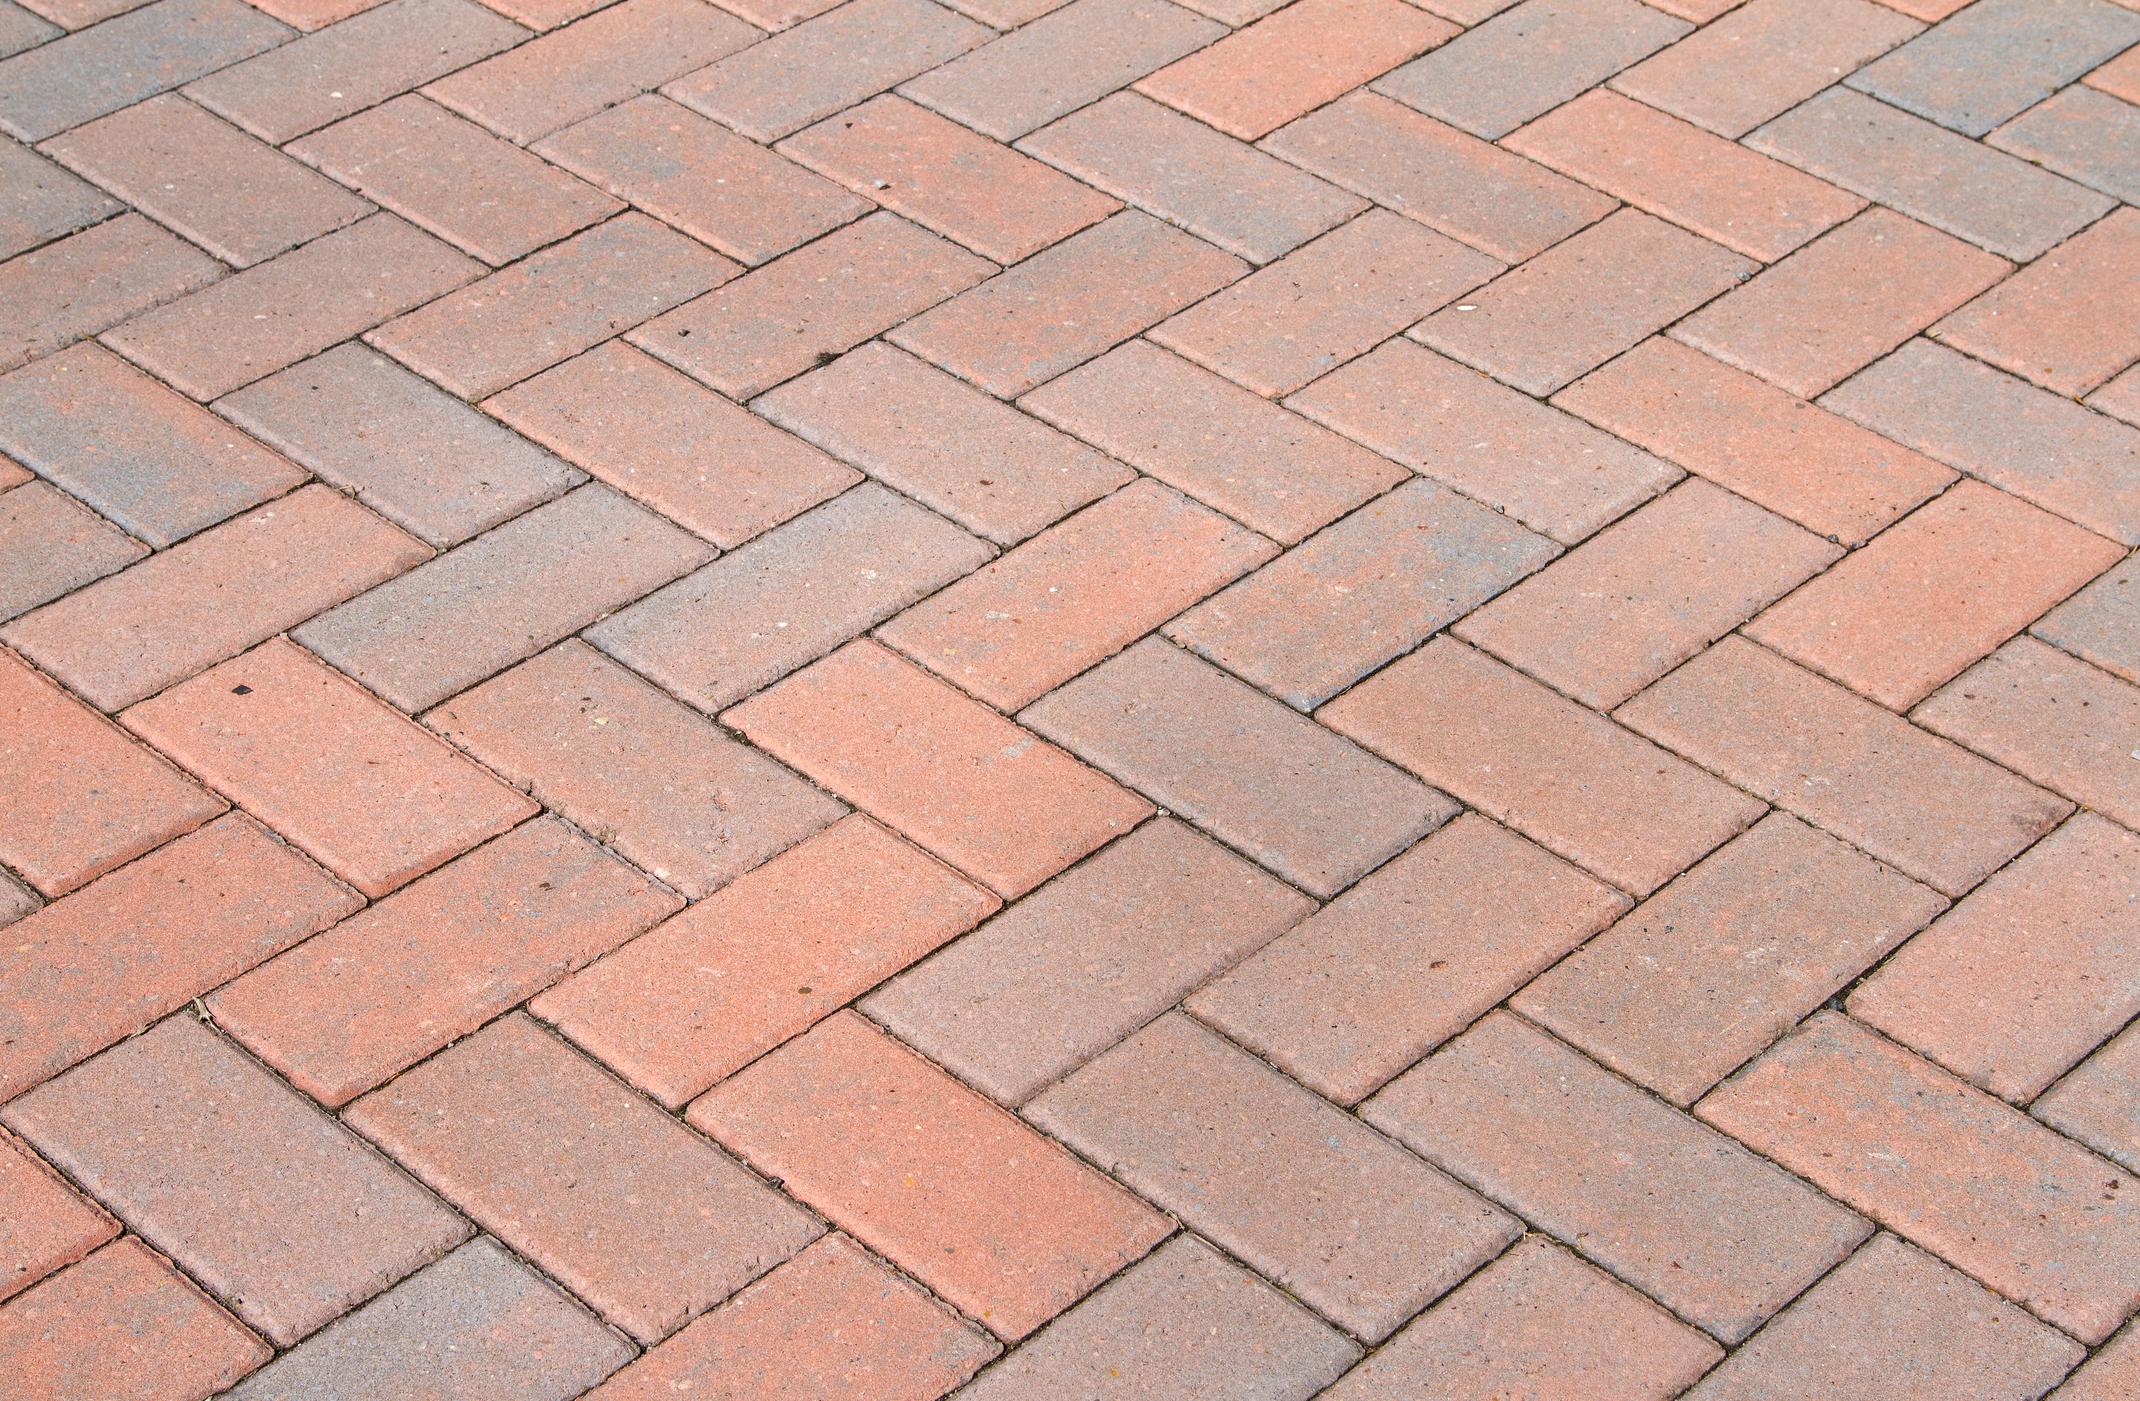 Advantages to Brick Driveways – Denver Brick Driveway Benefits